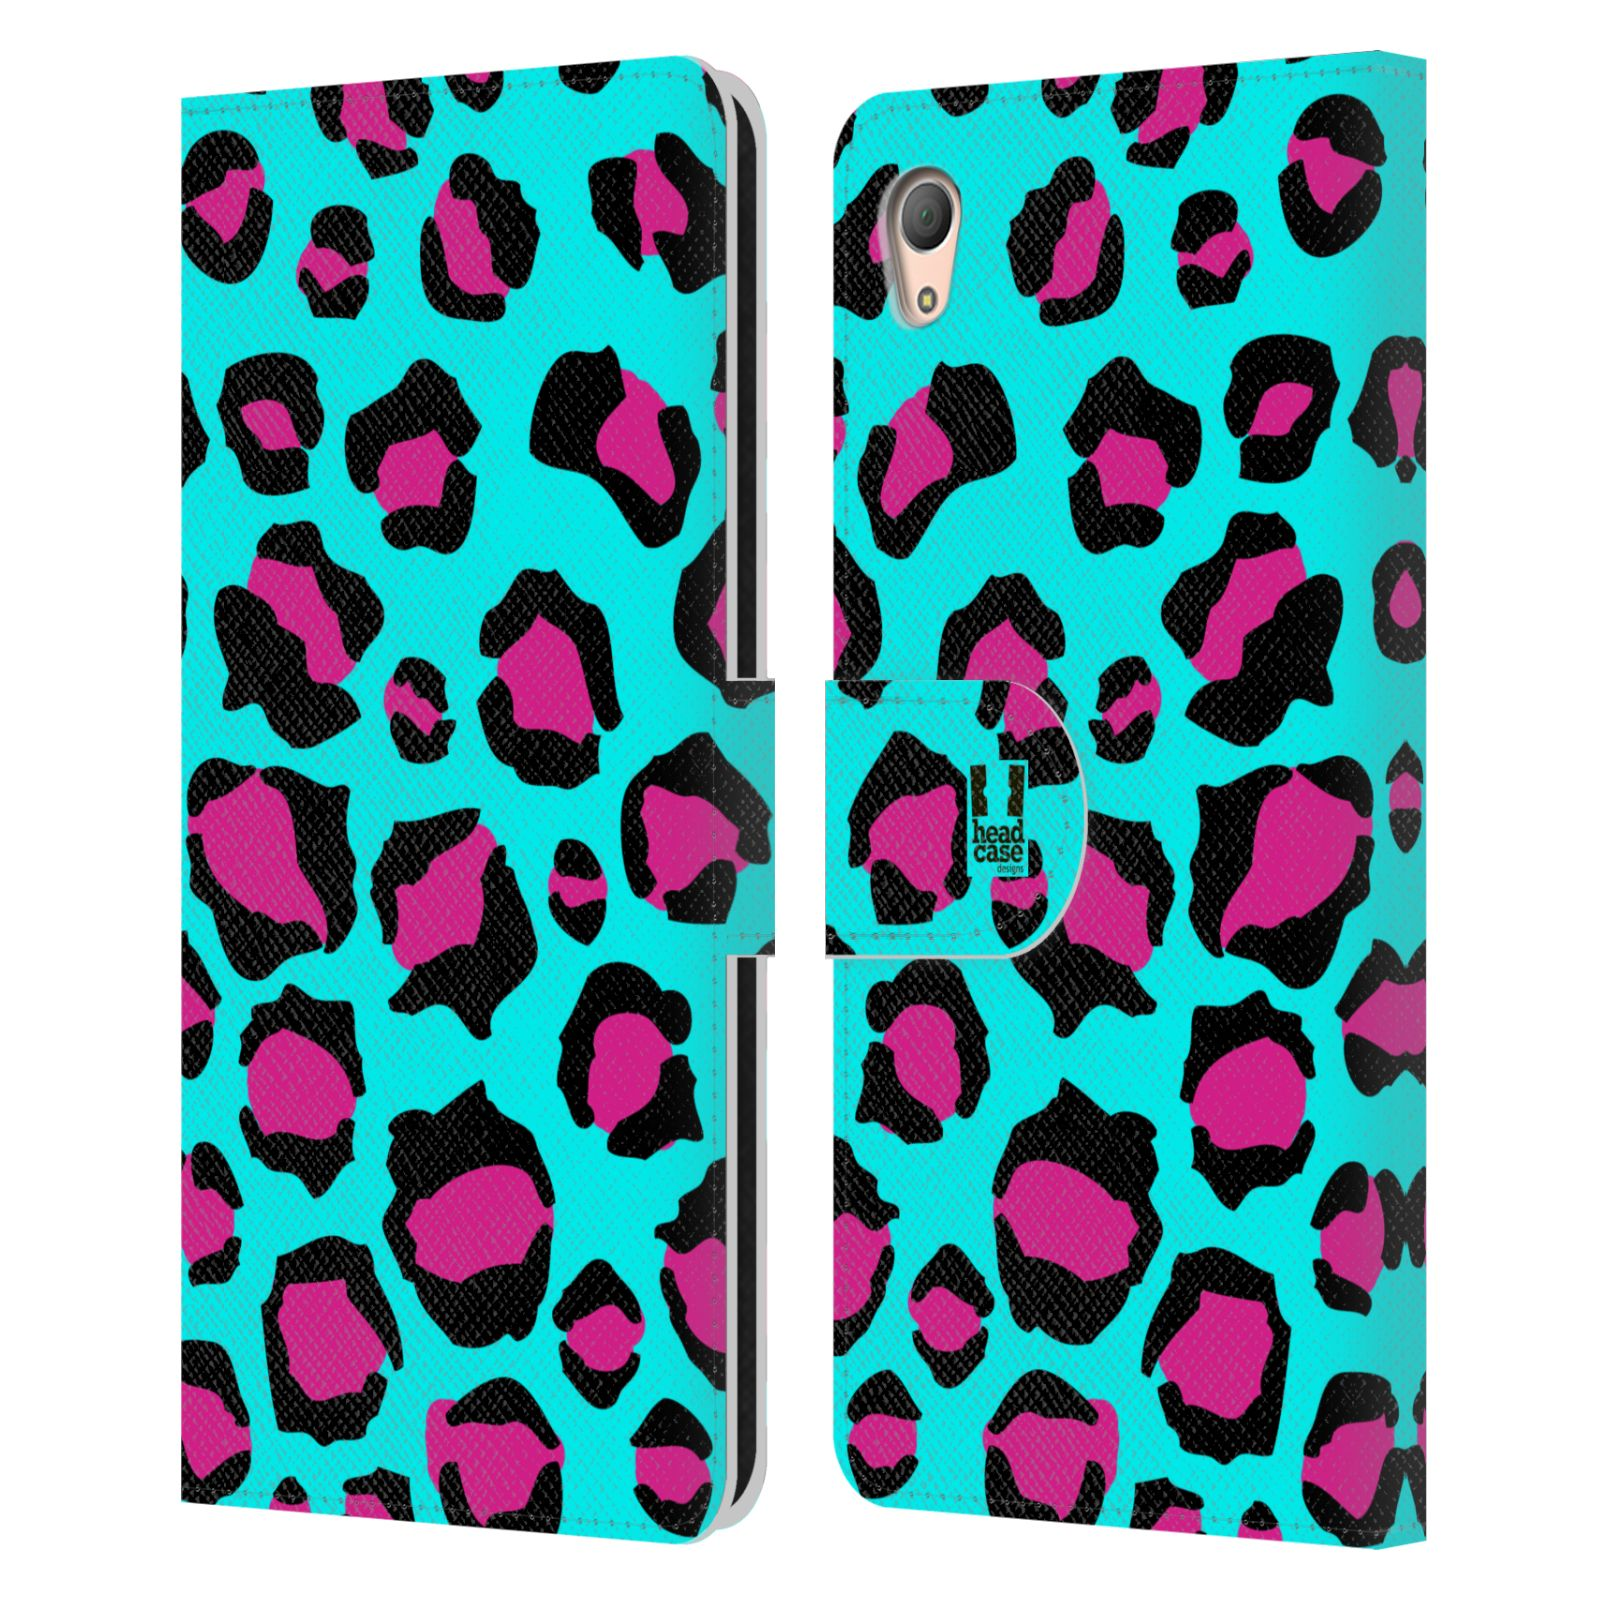 HEAD CASE Flipové pouzdro pro mobil SONY XPERIA Z3+ (PLUS) Zvířecí barevné vzory tyrkysový leopard